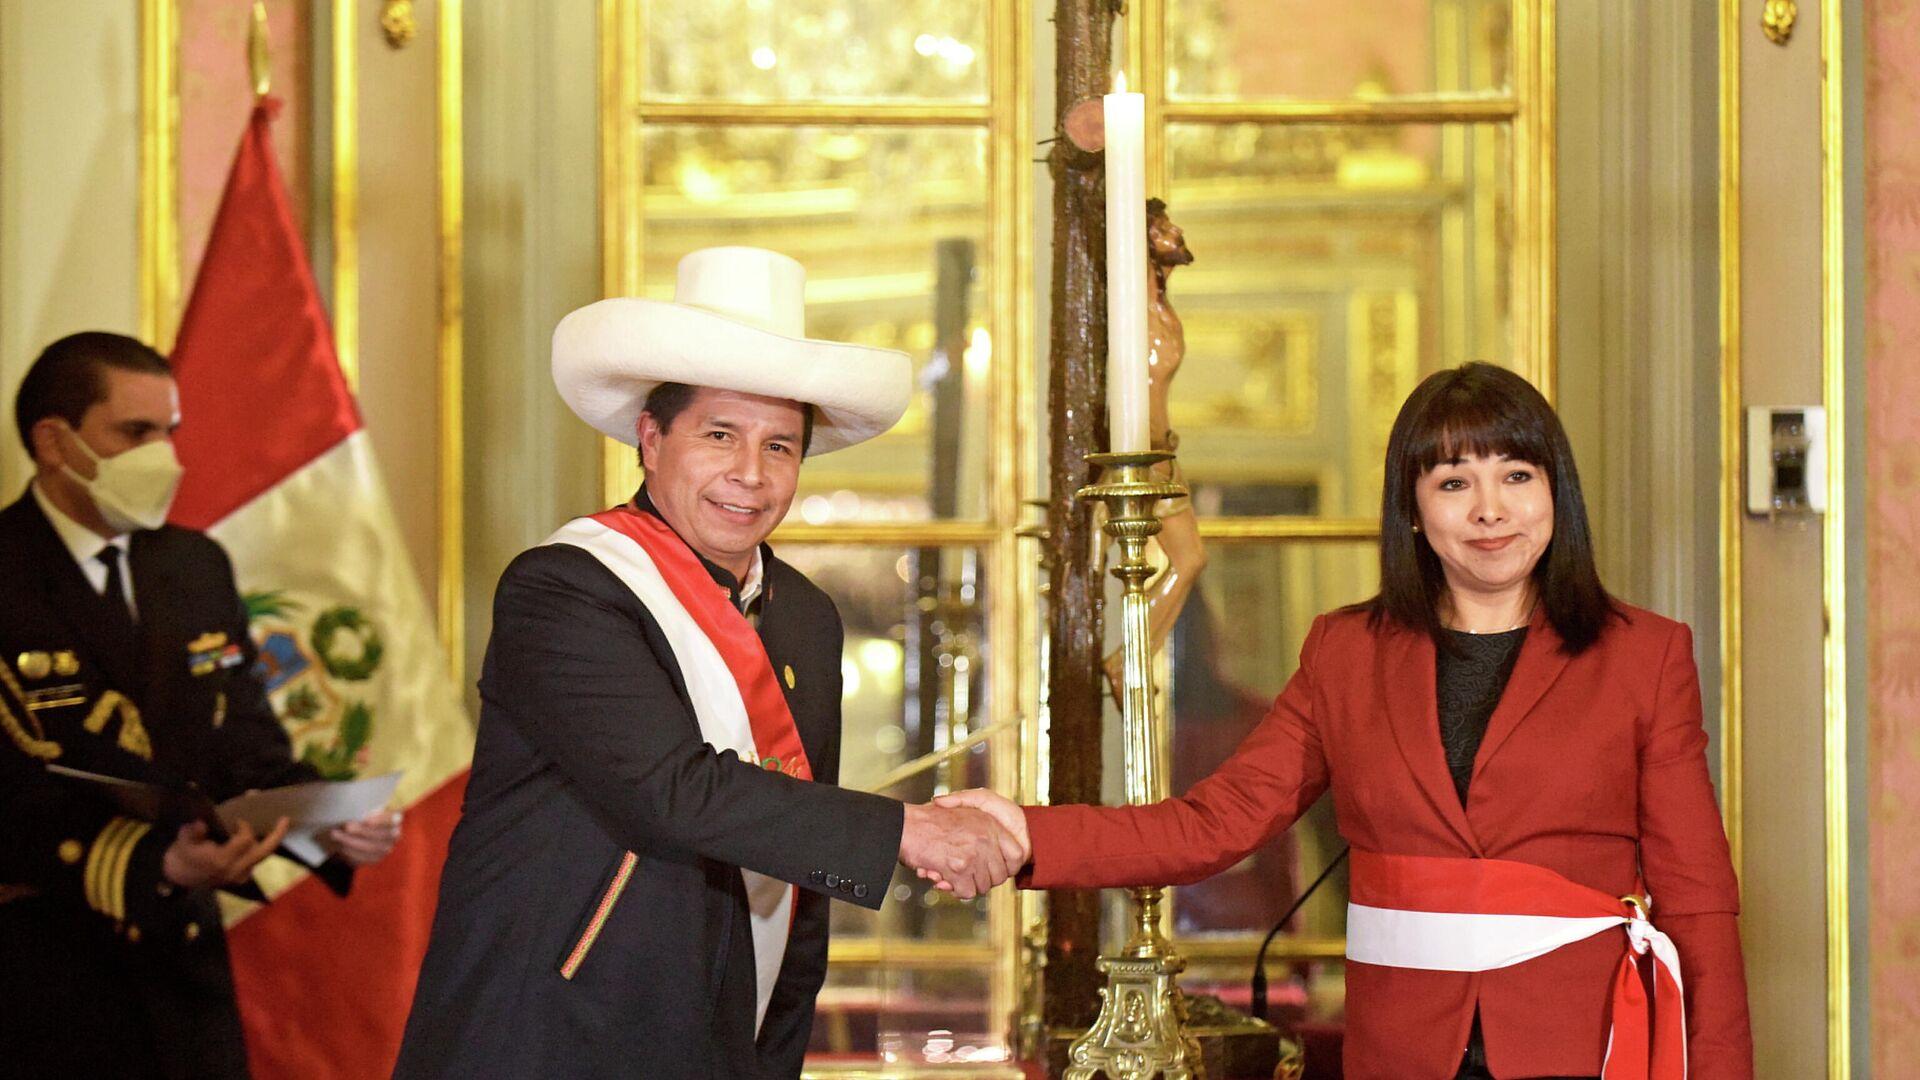 El presidente de Perú, Pedro Castillo, toma juramento a Mirtha Vázquez como primera ministra - Sputnik Mundo, 1920, 14.10.2021